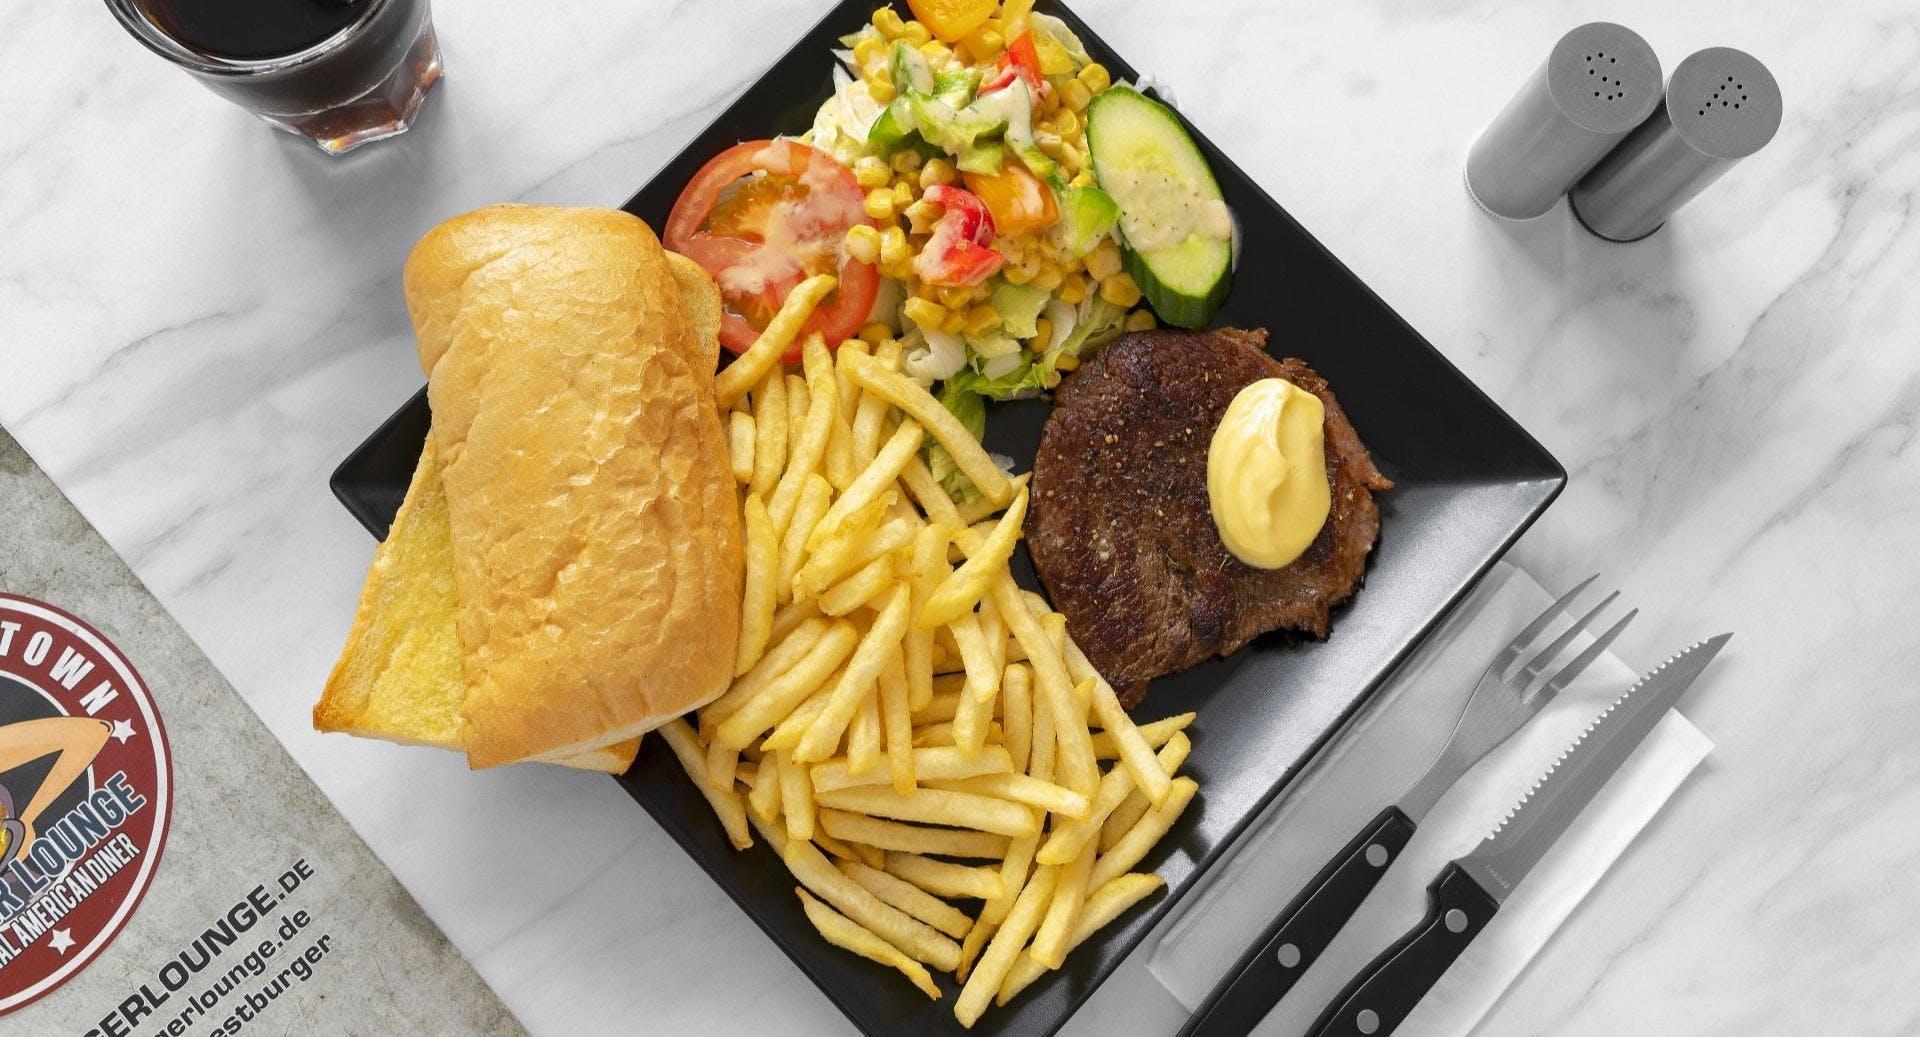 Burger Lounge Bramfeld Hamburg image 3